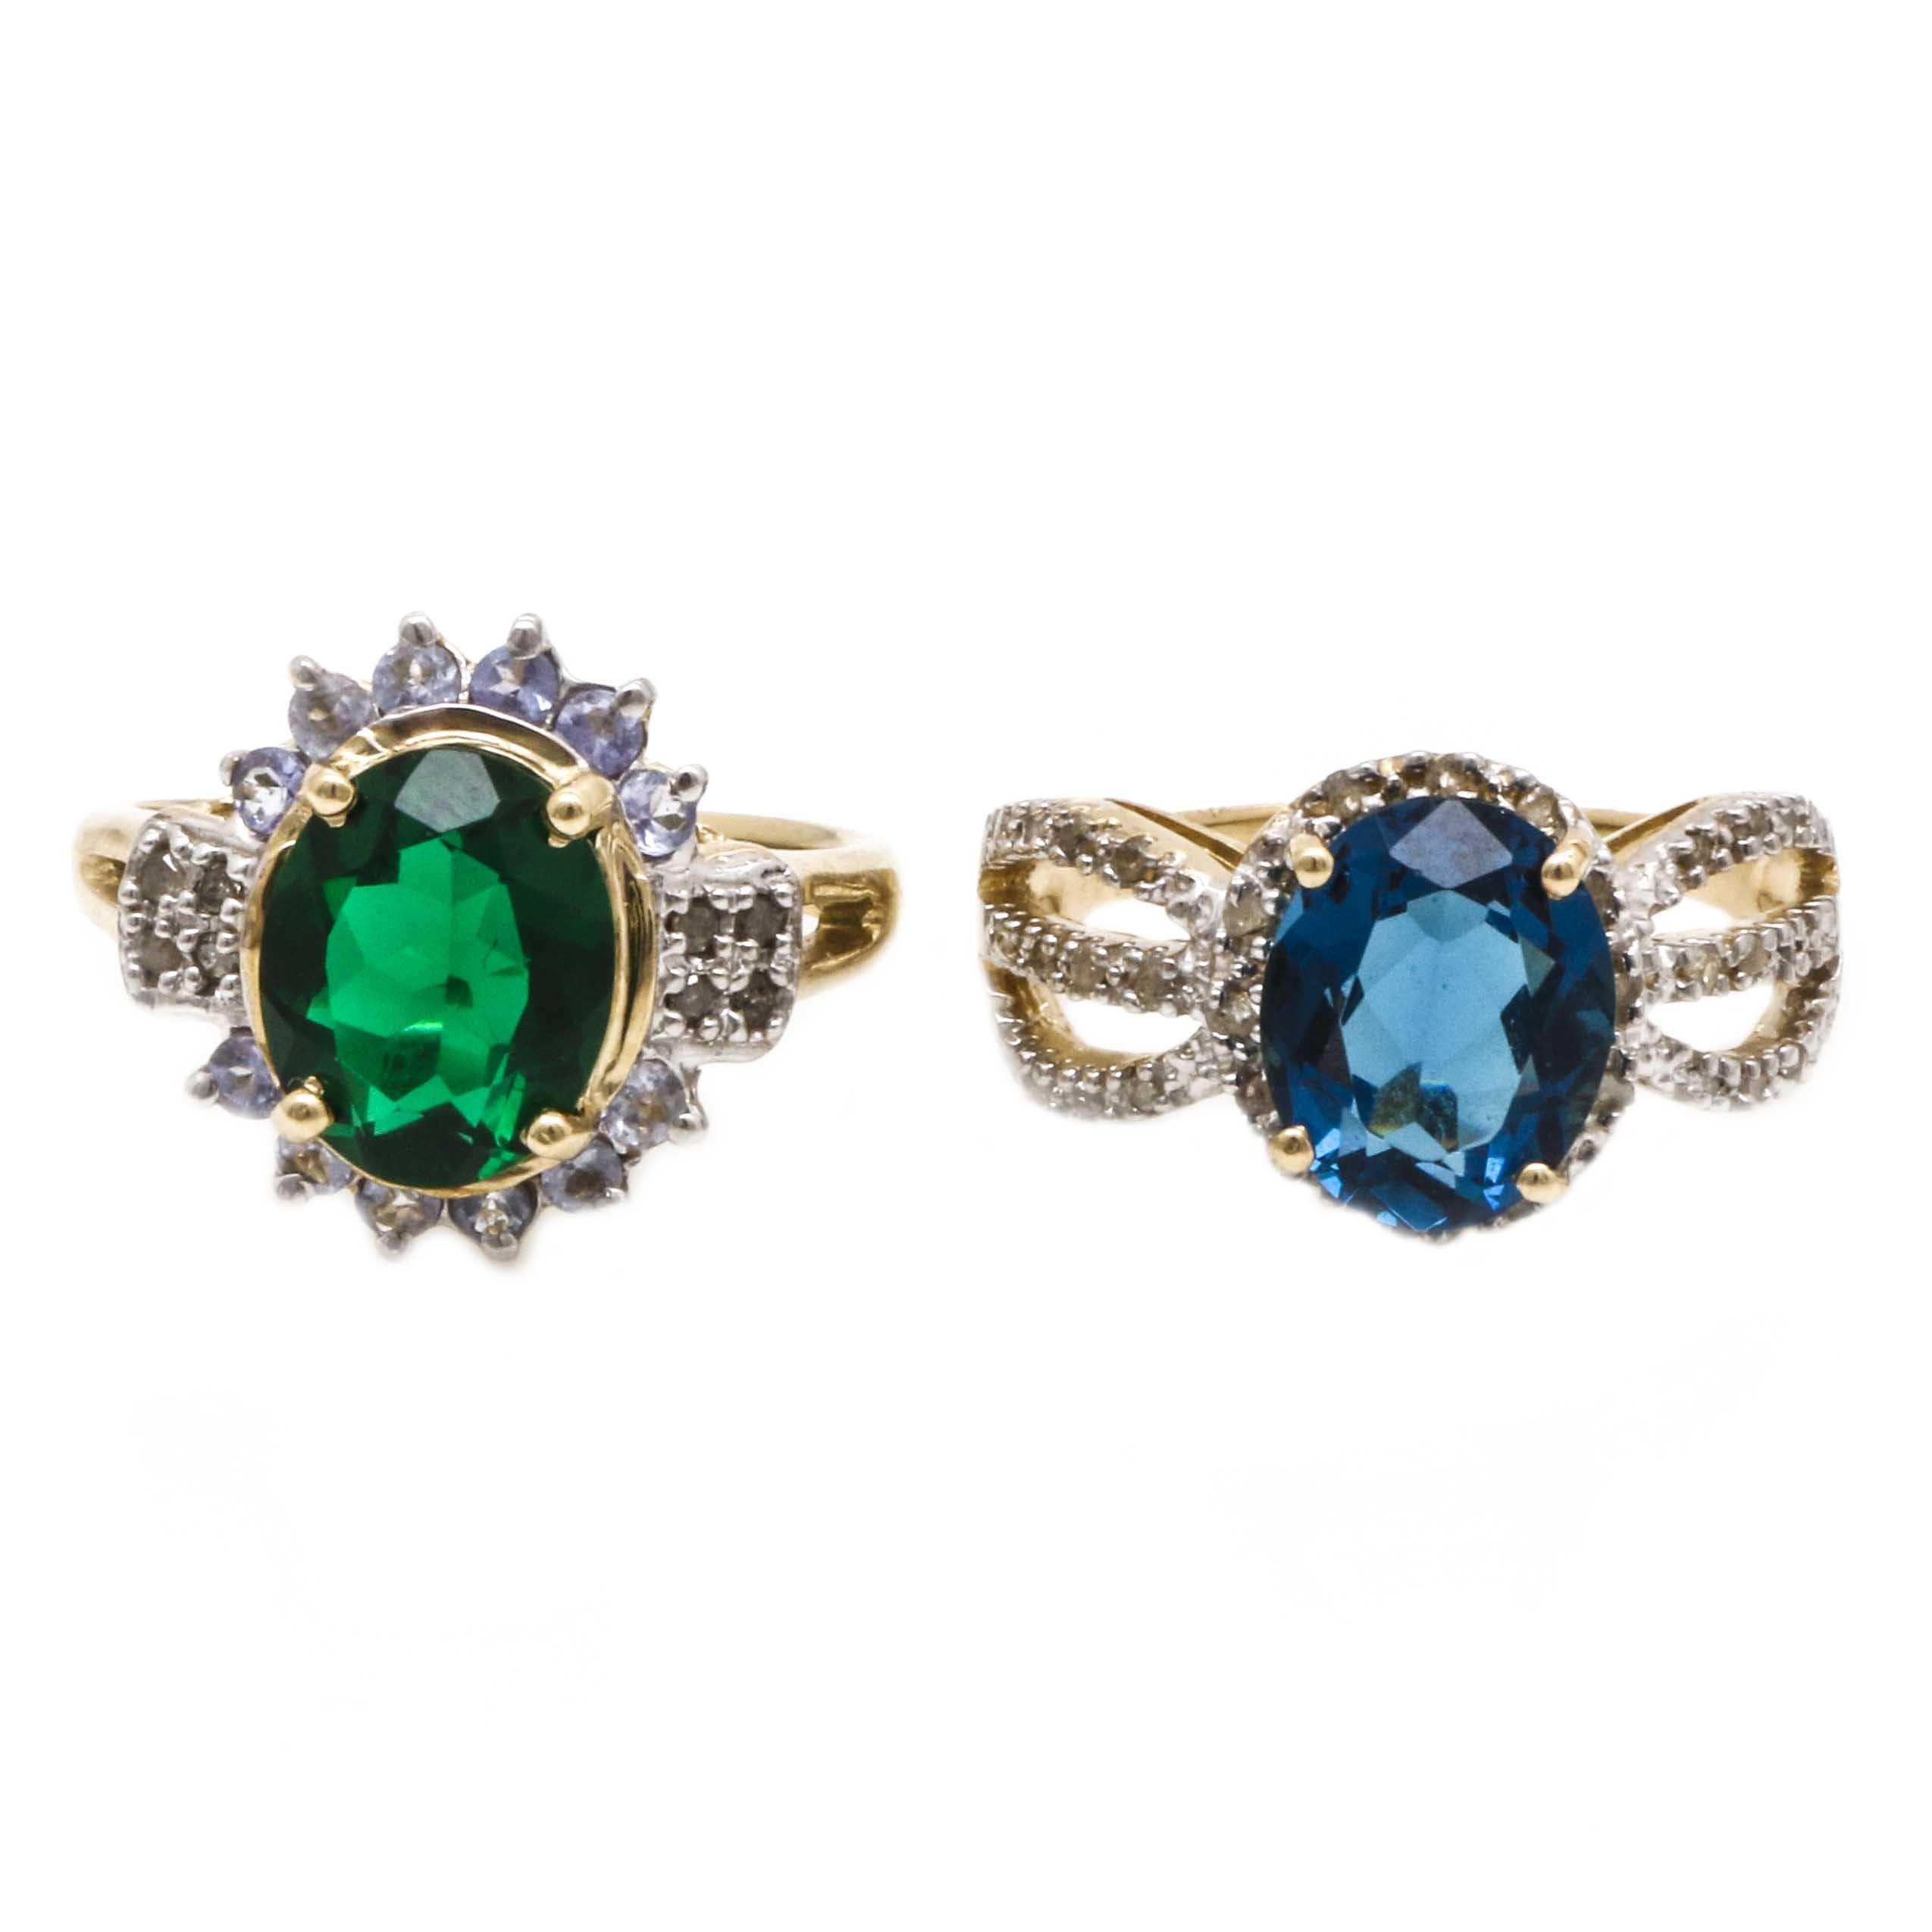 Two 10K Yellow Gold Glass, Tanzanite, and Diamond Rings